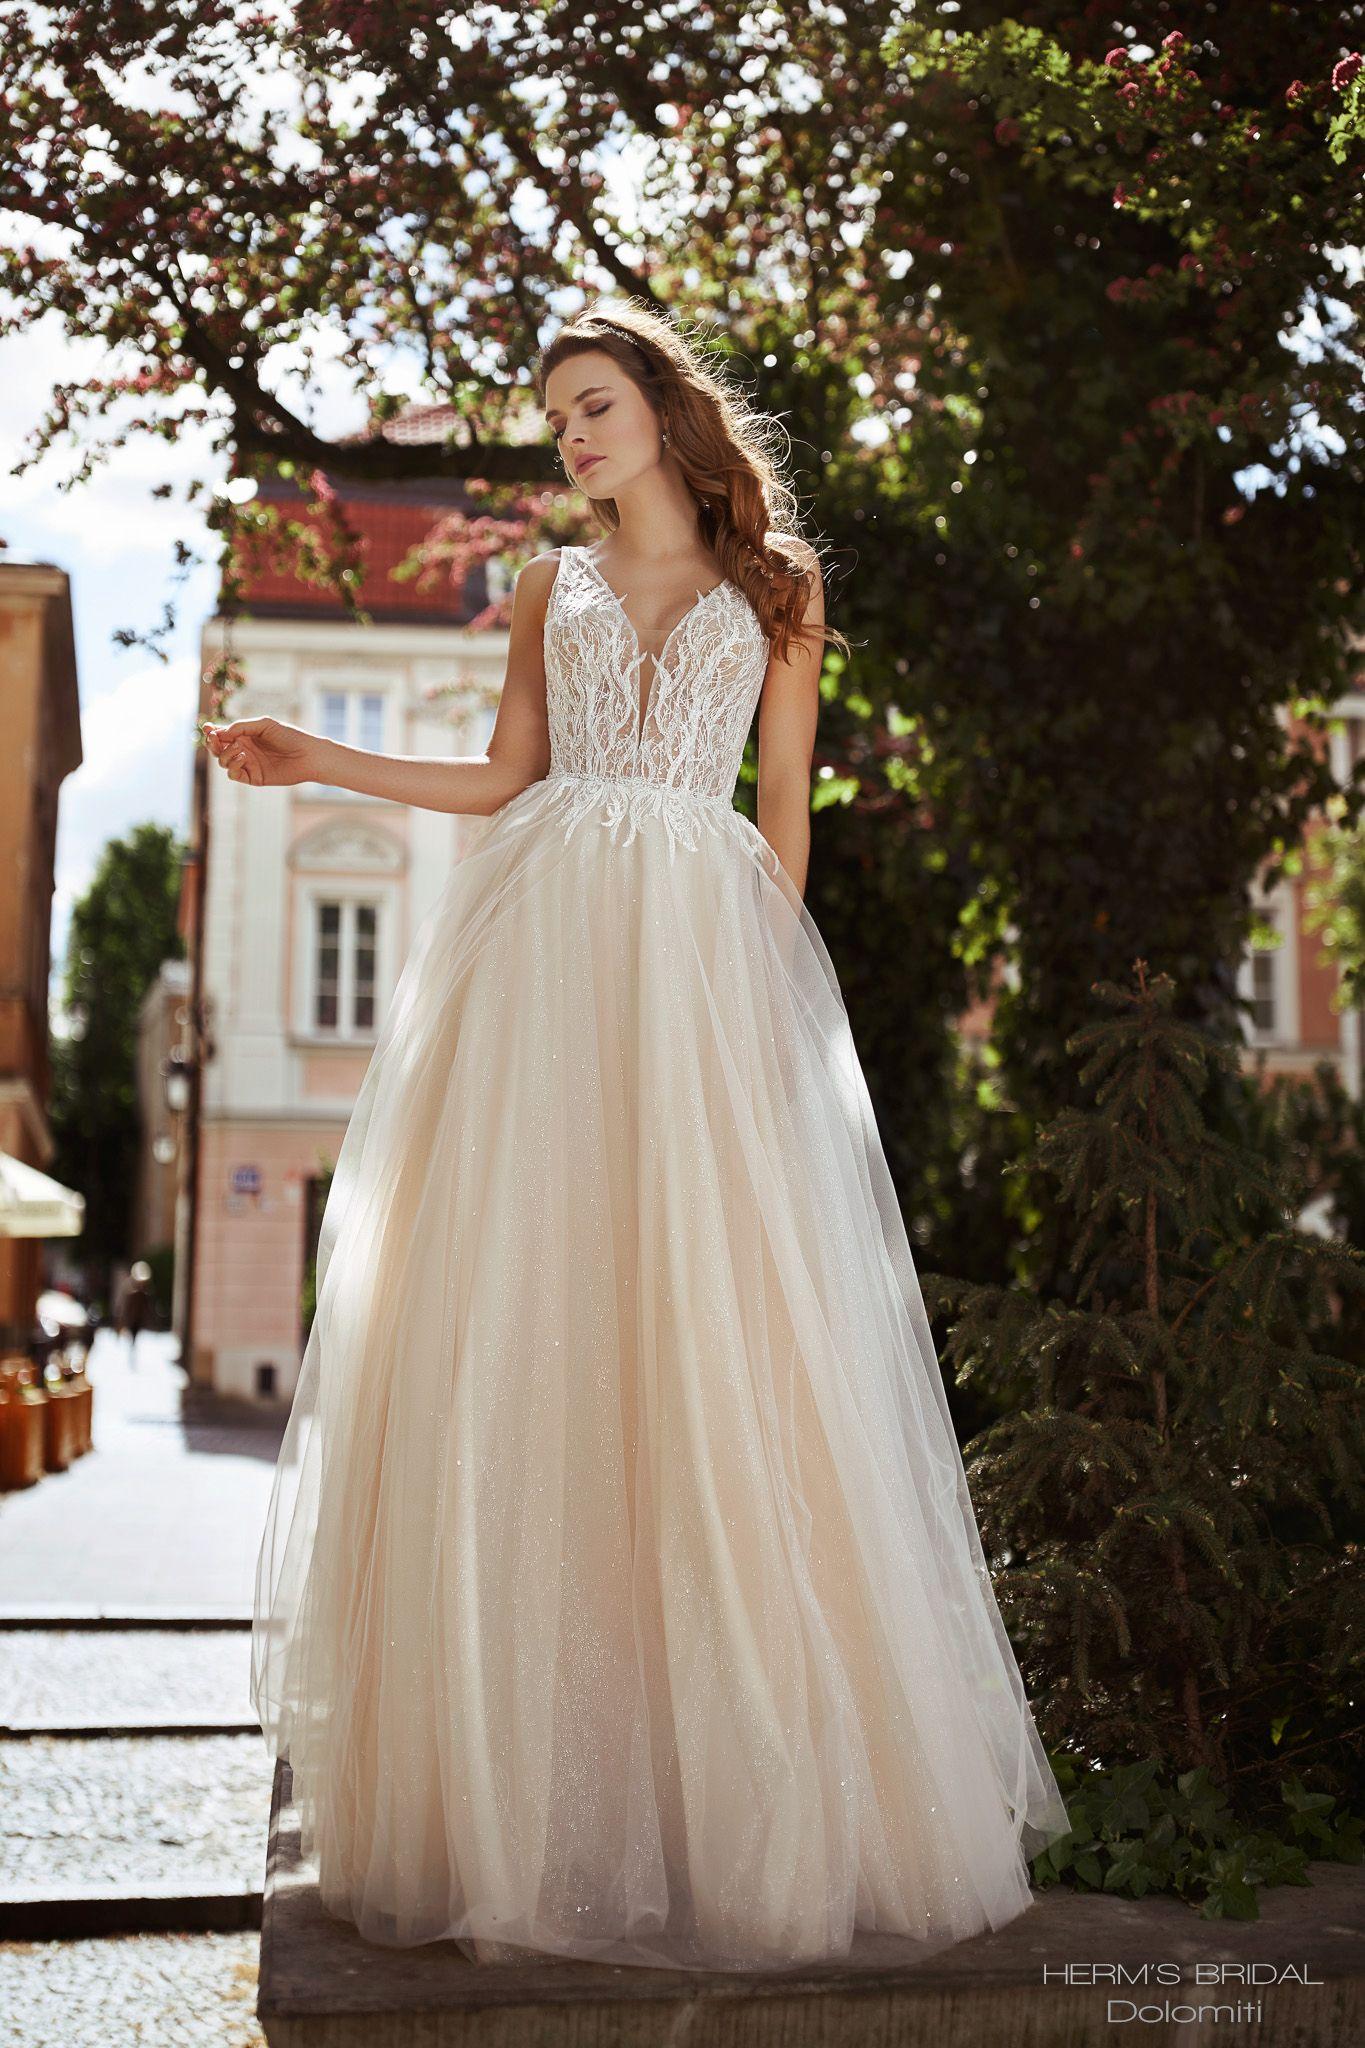 suknia slubna herms bridal Dolomiti 1